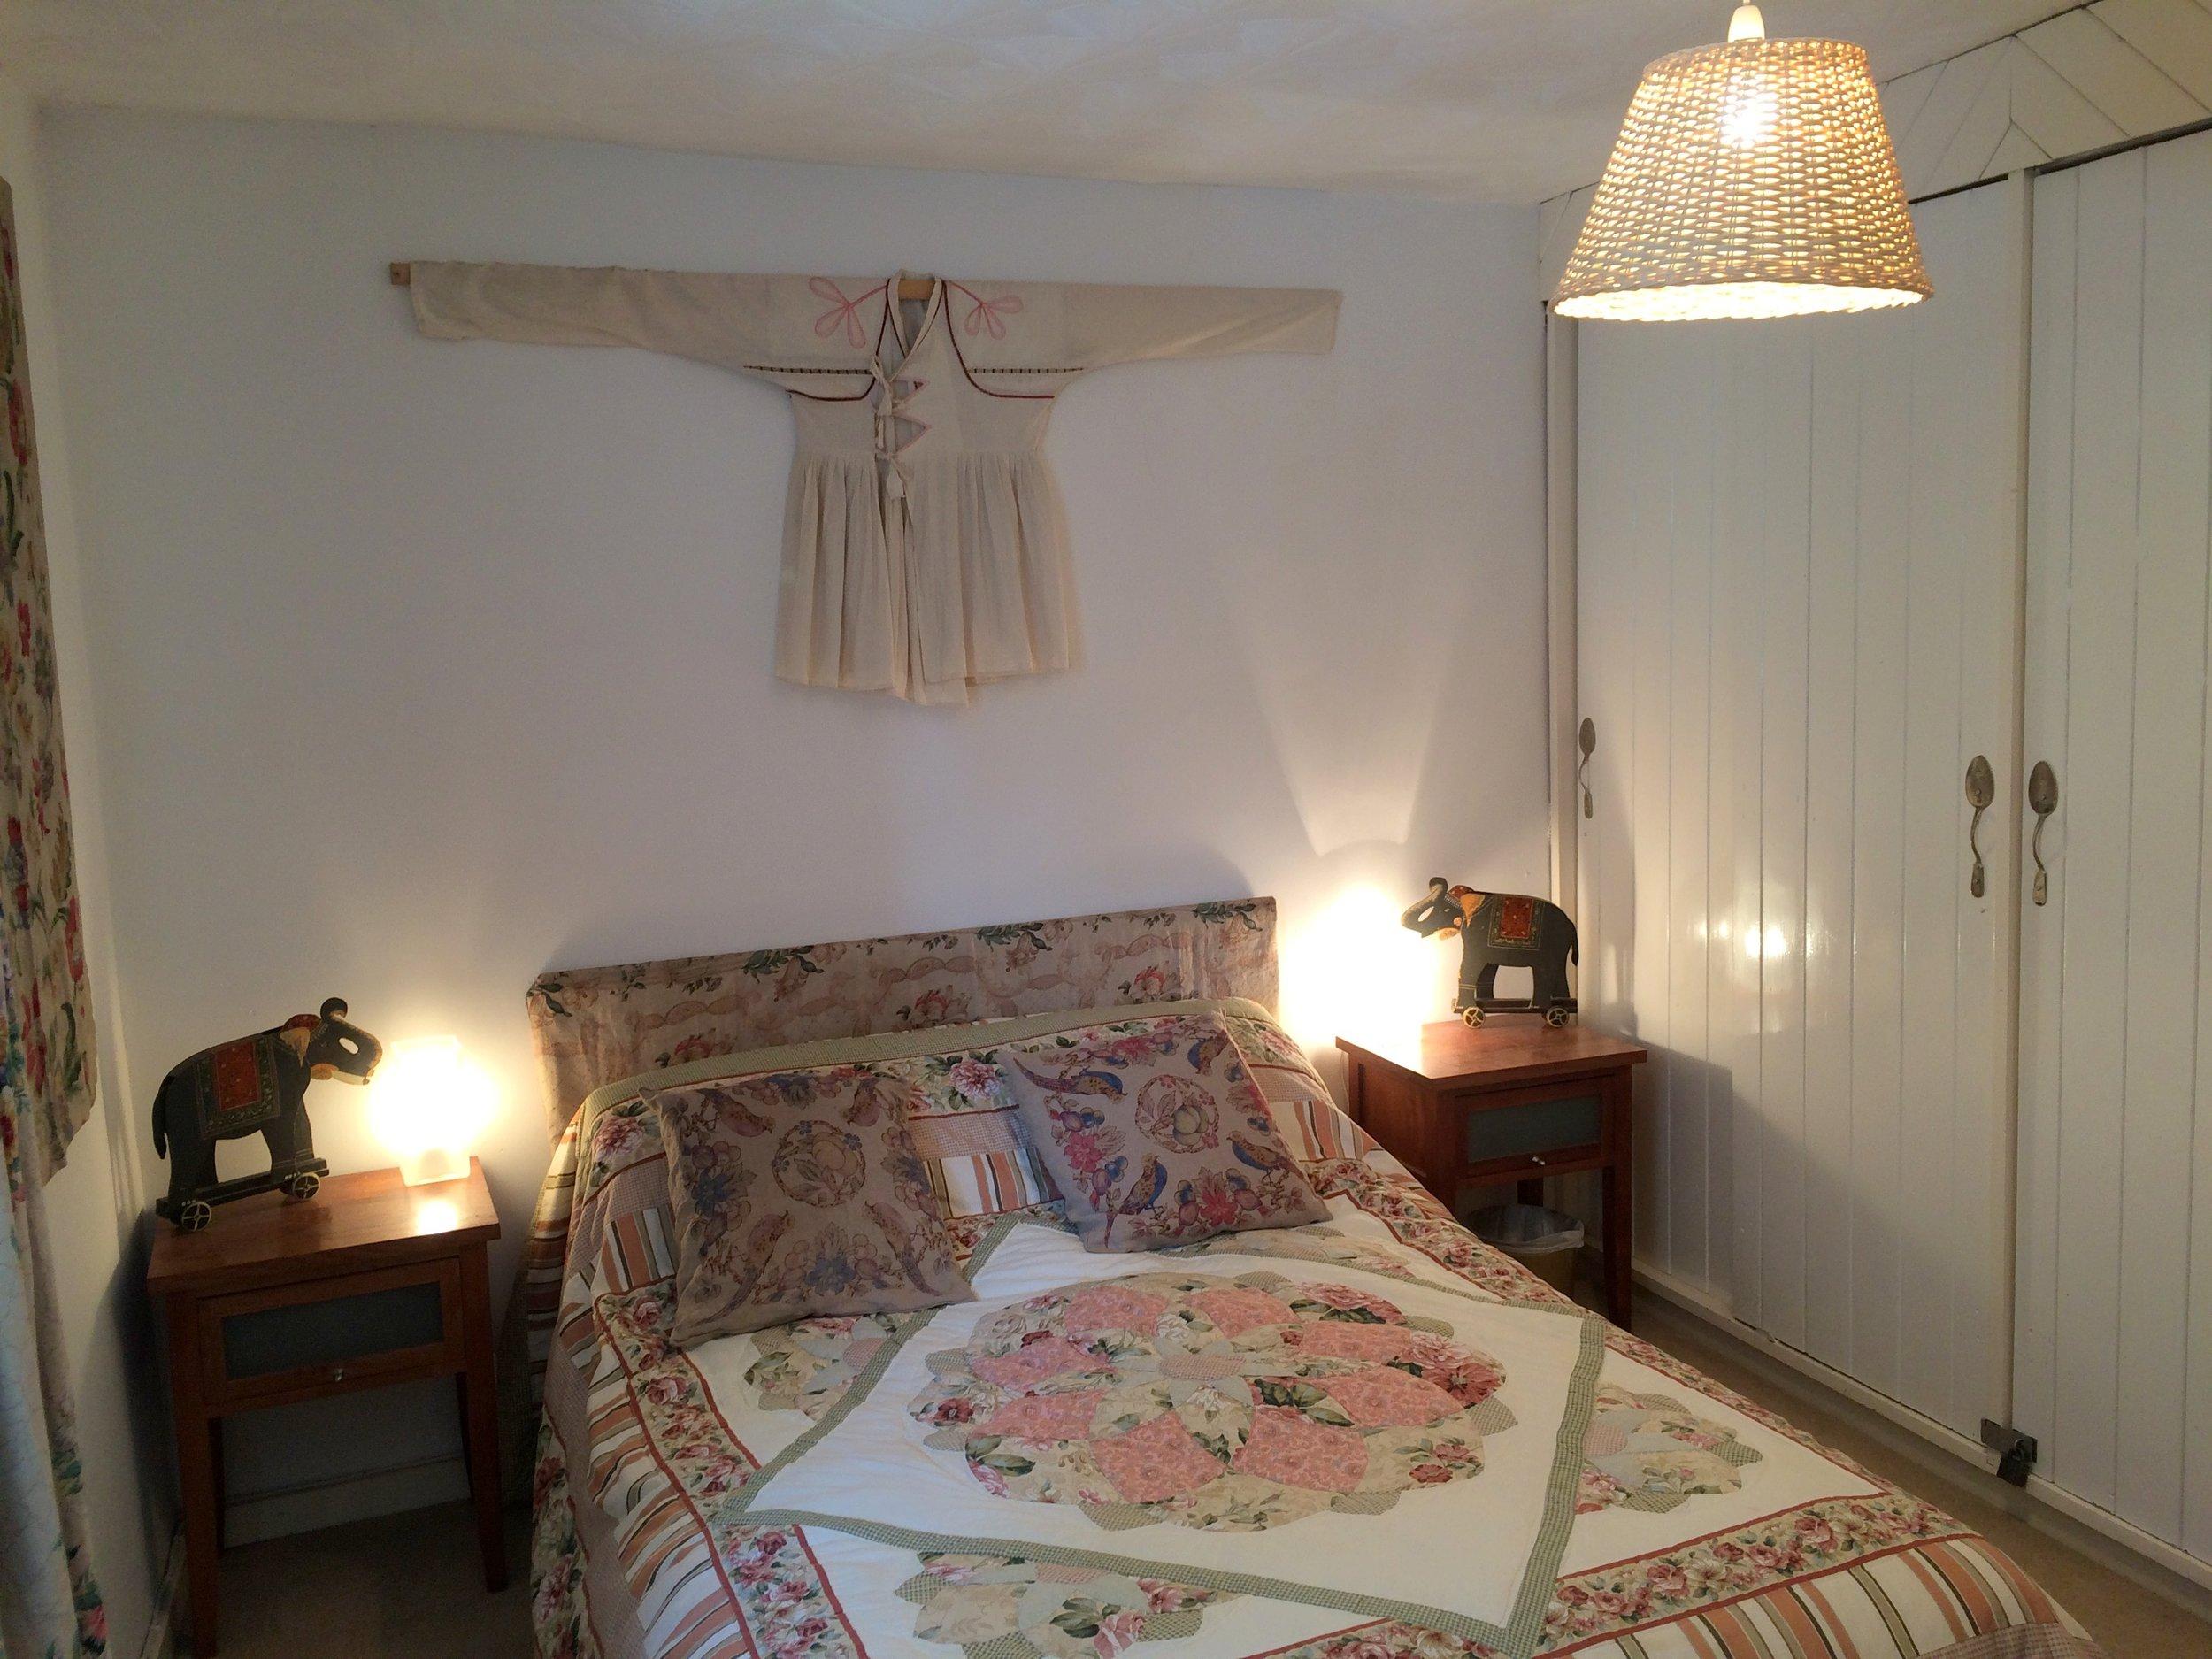 george cottage bedroom vintage rose room  (9).jpg